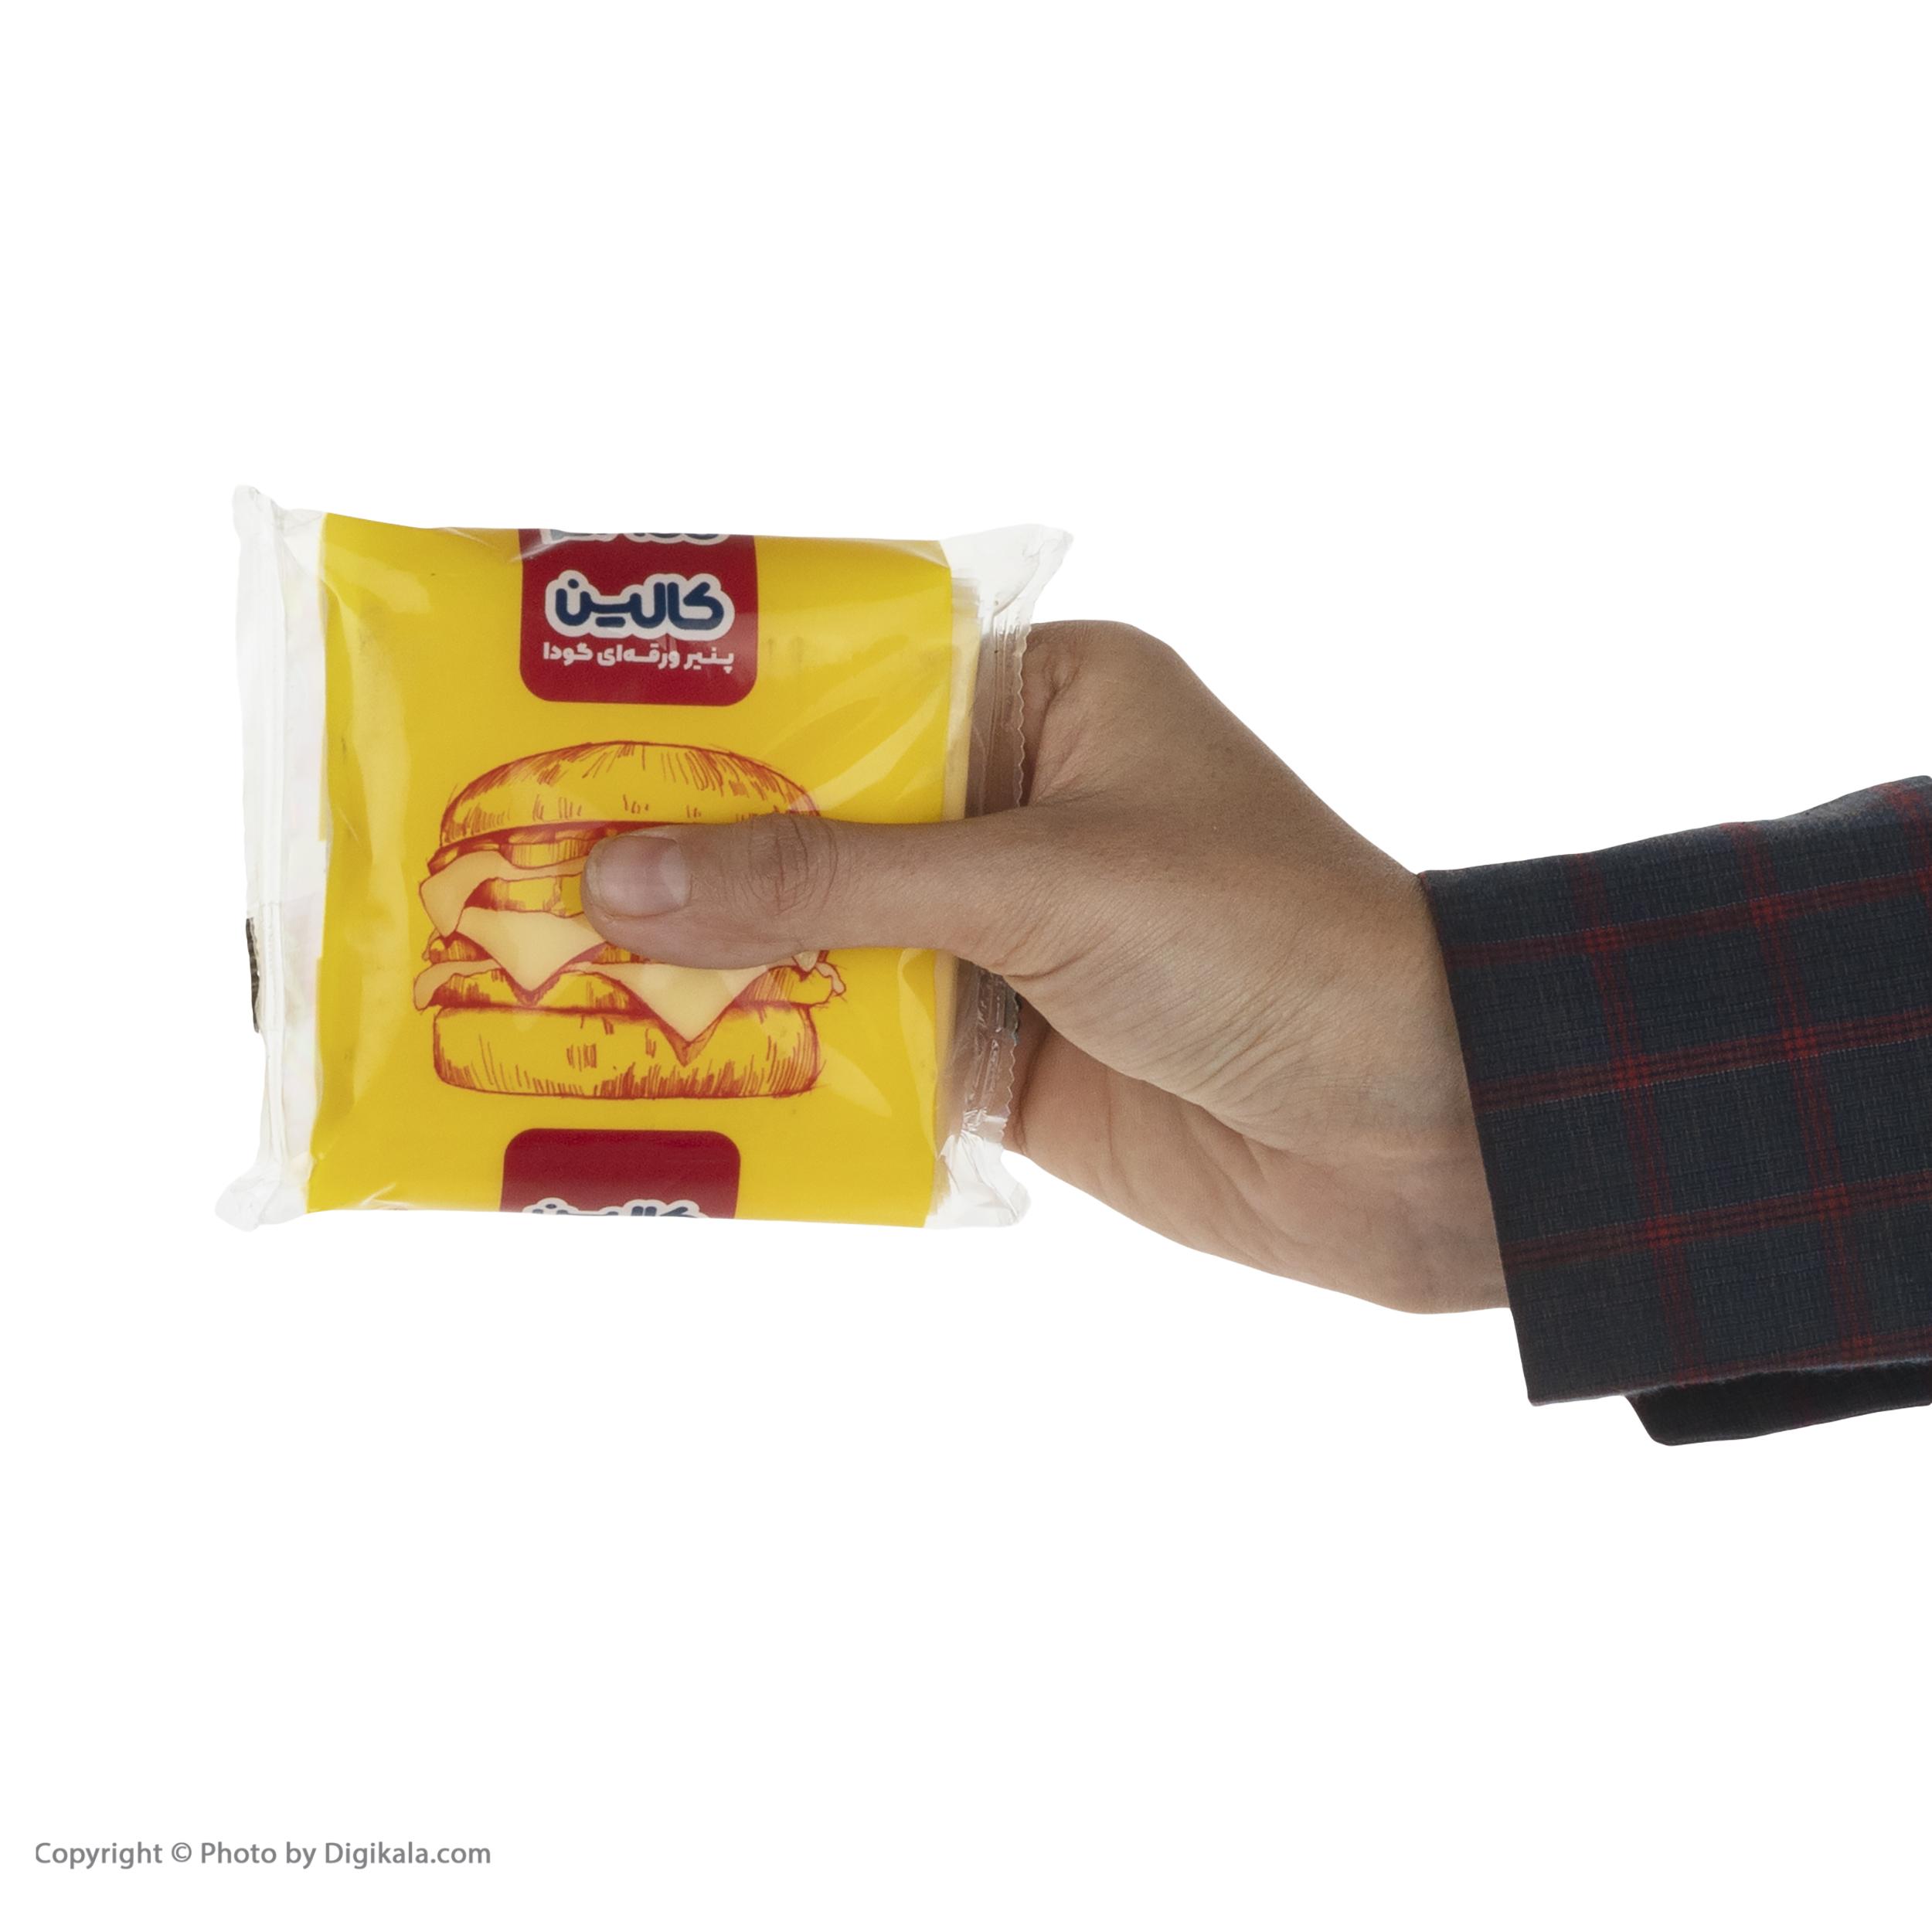 پنیر گودا ورقهای کالین - 180 گرم main 1 4